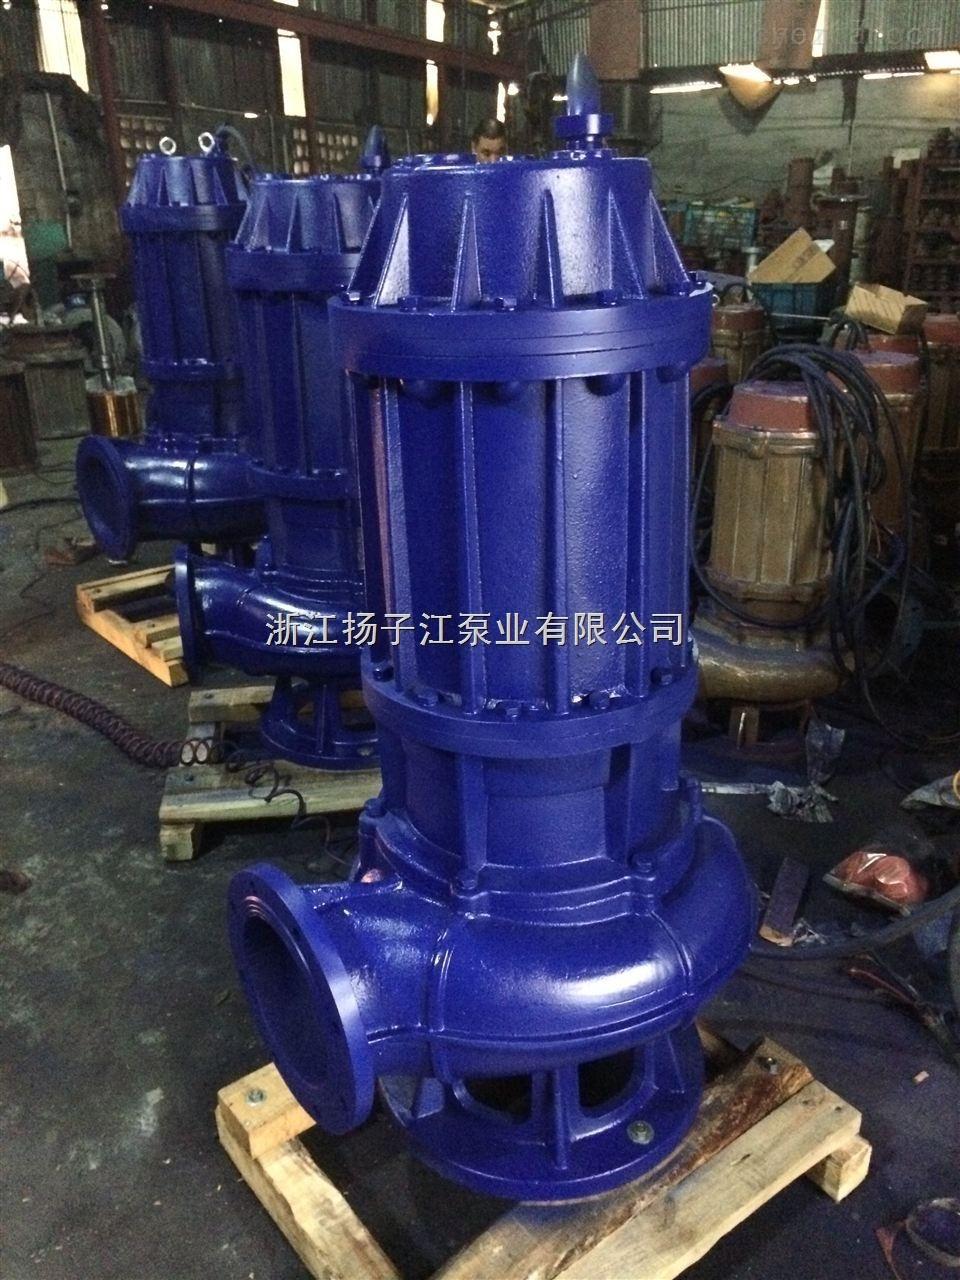 QW潜污泵 集水坑潜水泵 80WQ40-15-4 集水坑潜污泵